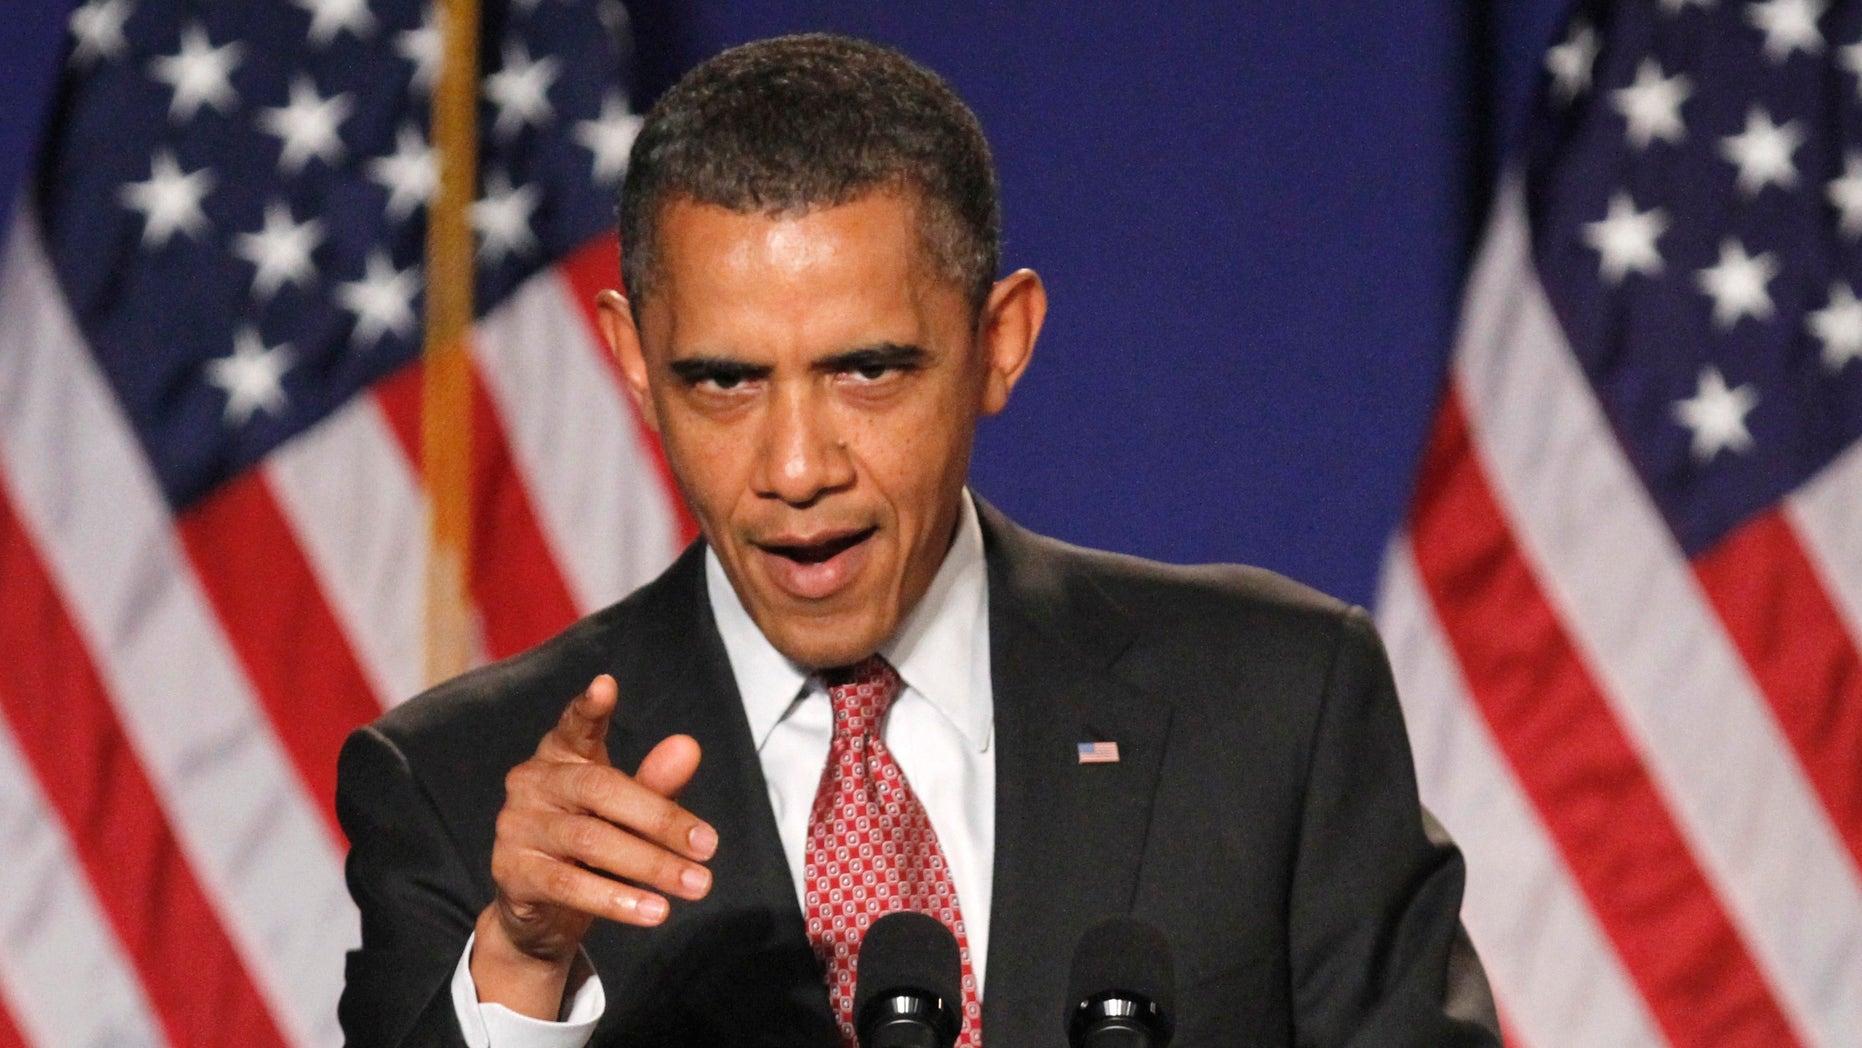 In this photo taken Friday, Sept. 16, 2011, President Barack Obama gestures while speaking in Alexandria, Va.